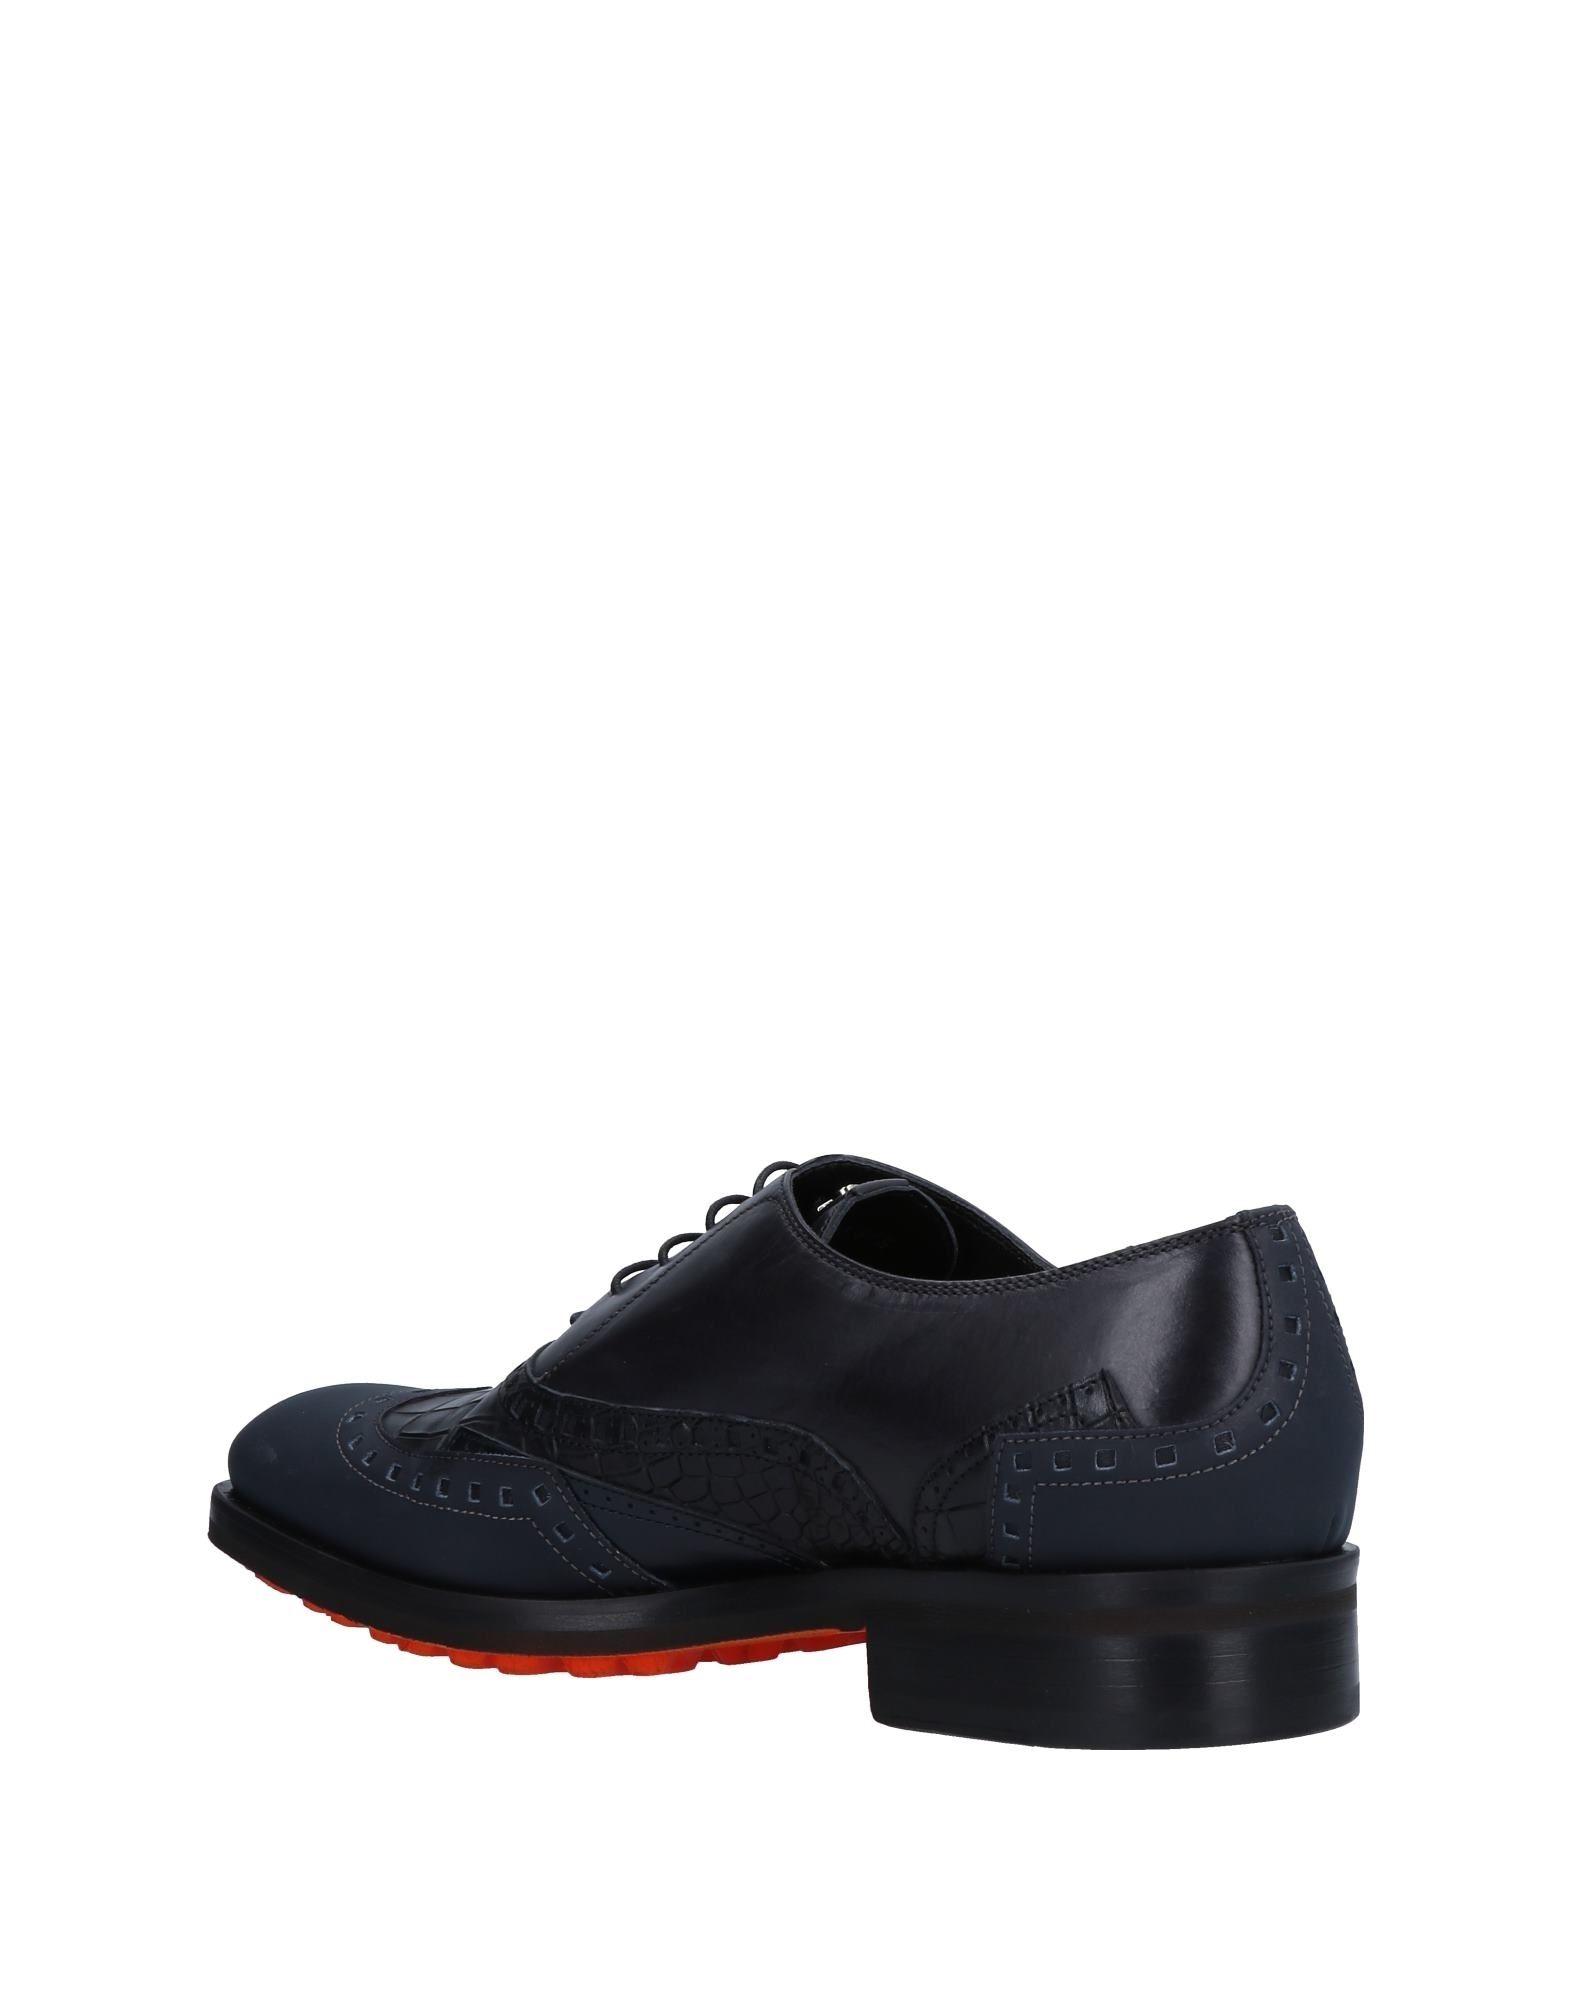 John Richmond Schnürschuhe Herren  11516923QW Gute Qualität beliebte Schuhe